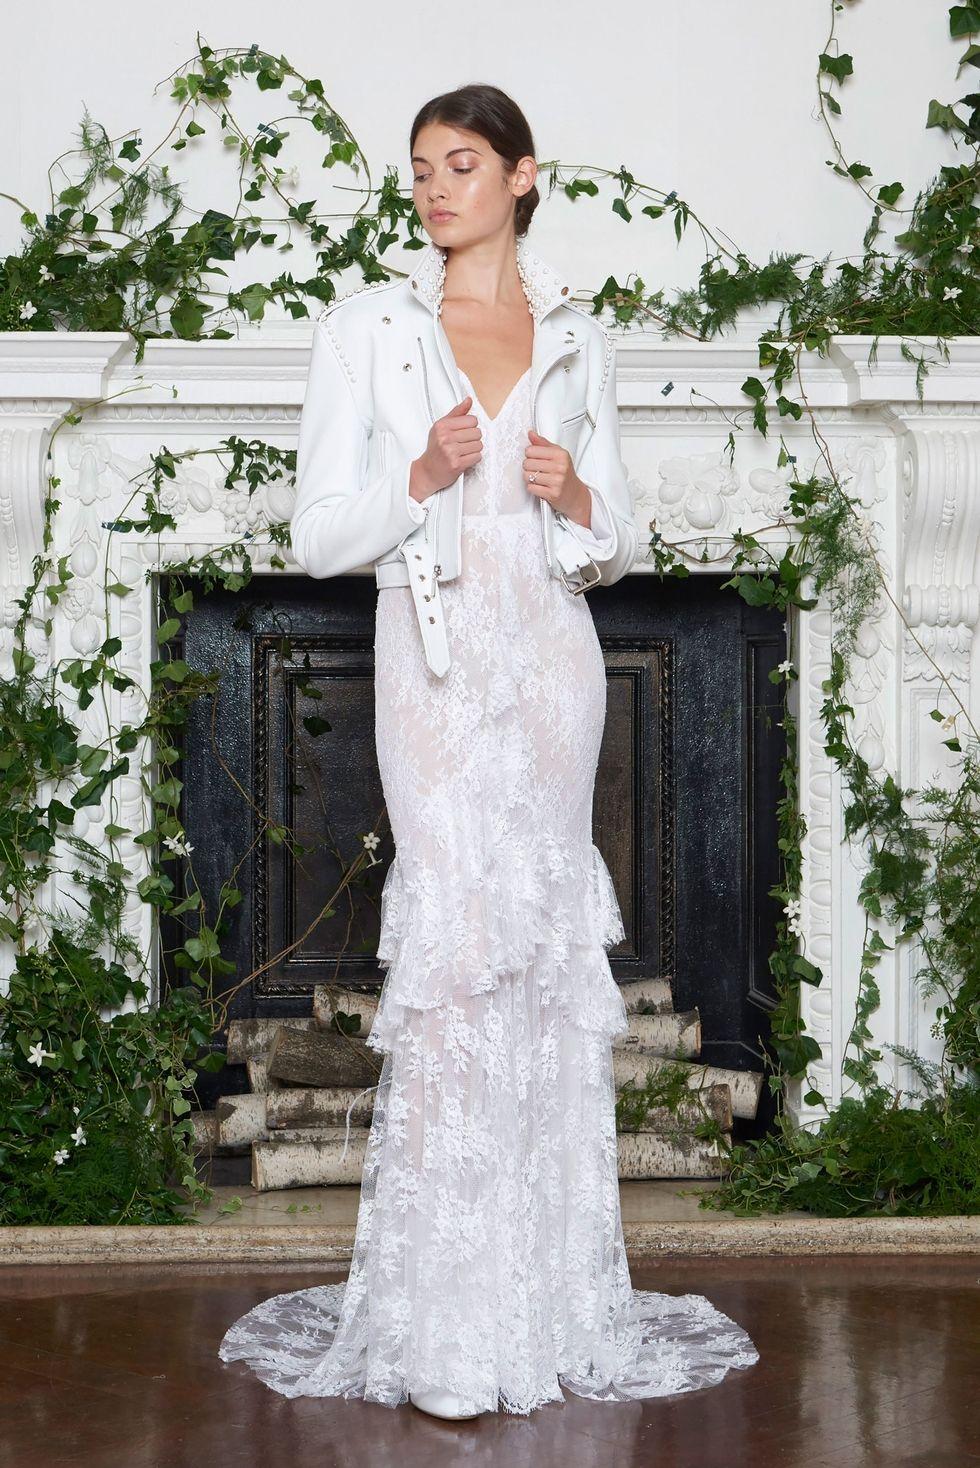 Monique Ihuillier 2018 Bridal